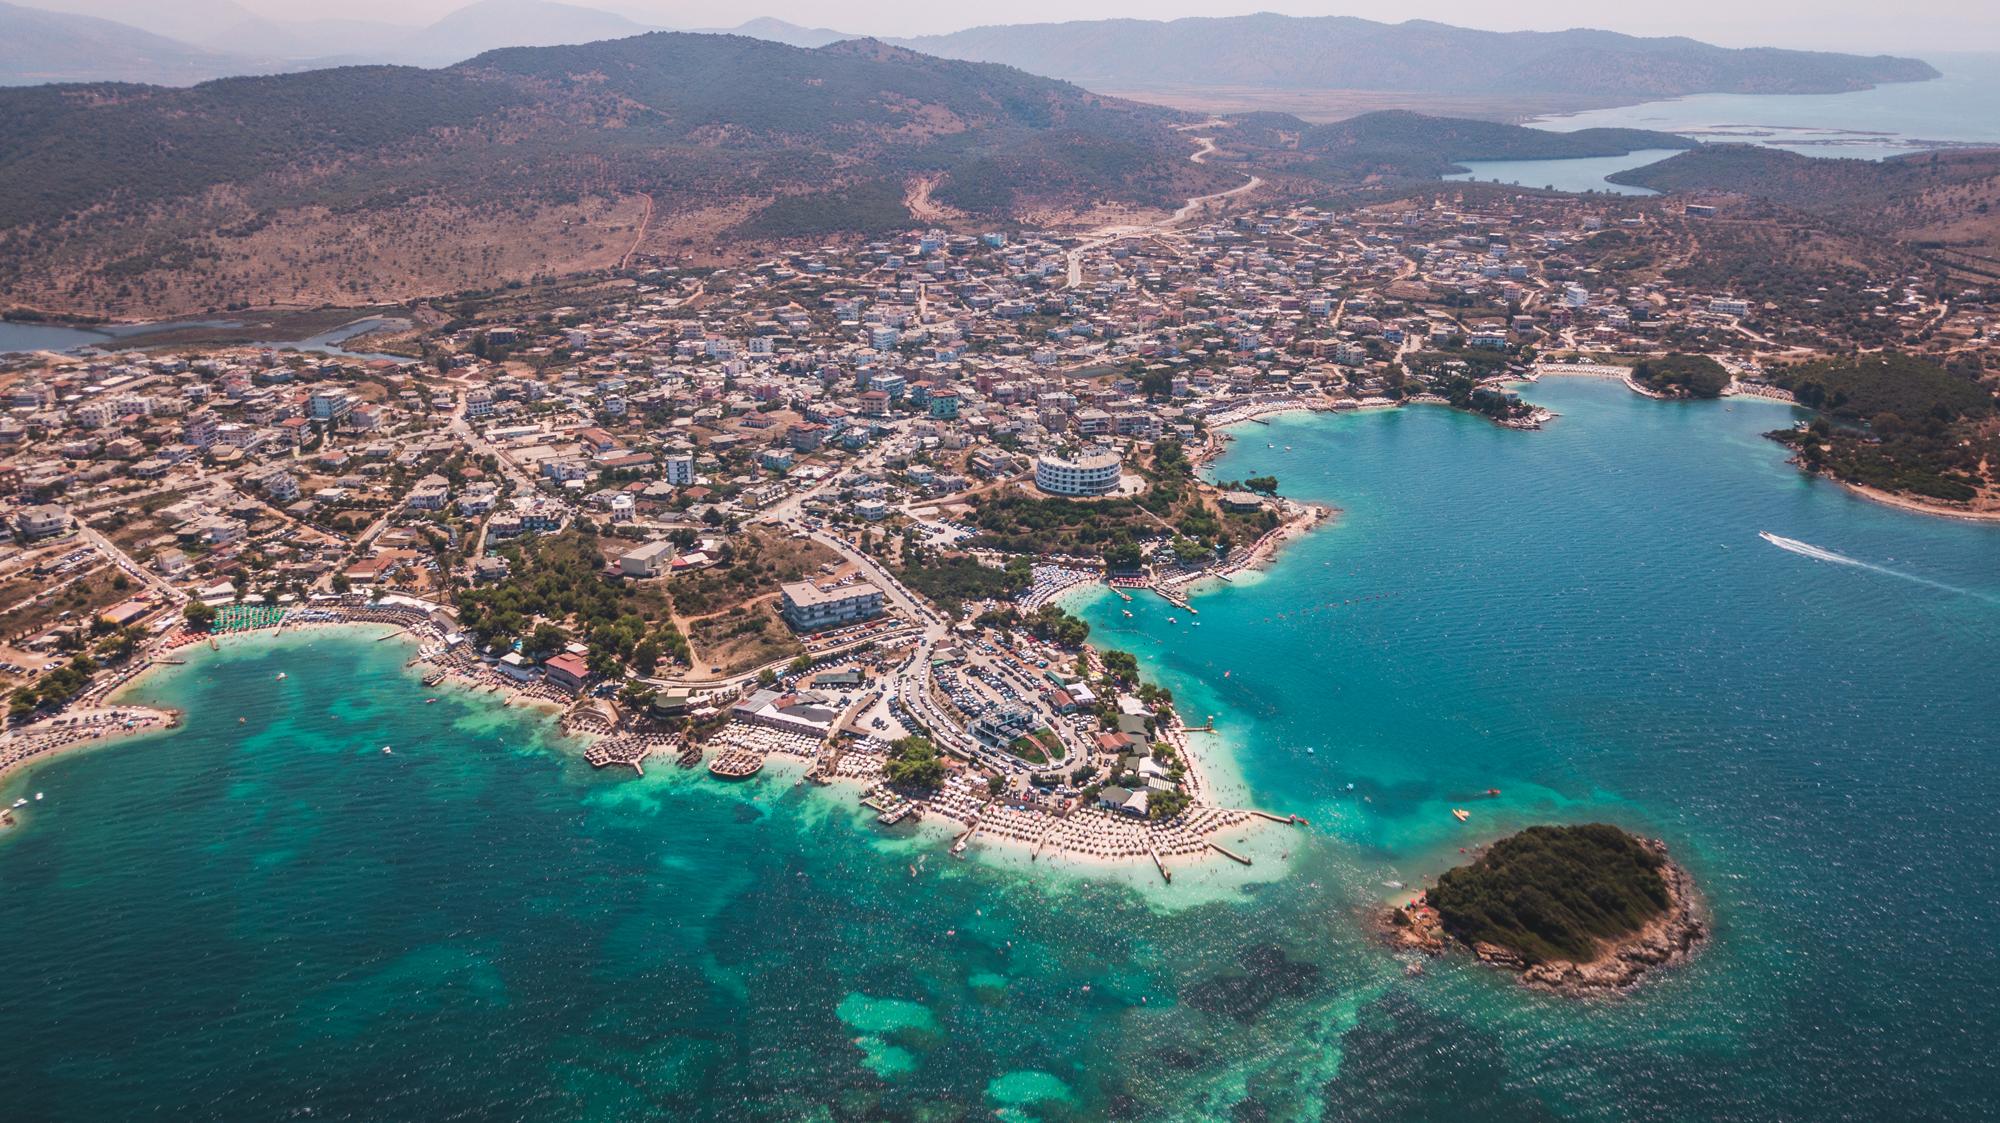 An aerial shot of Ksamil, Albania